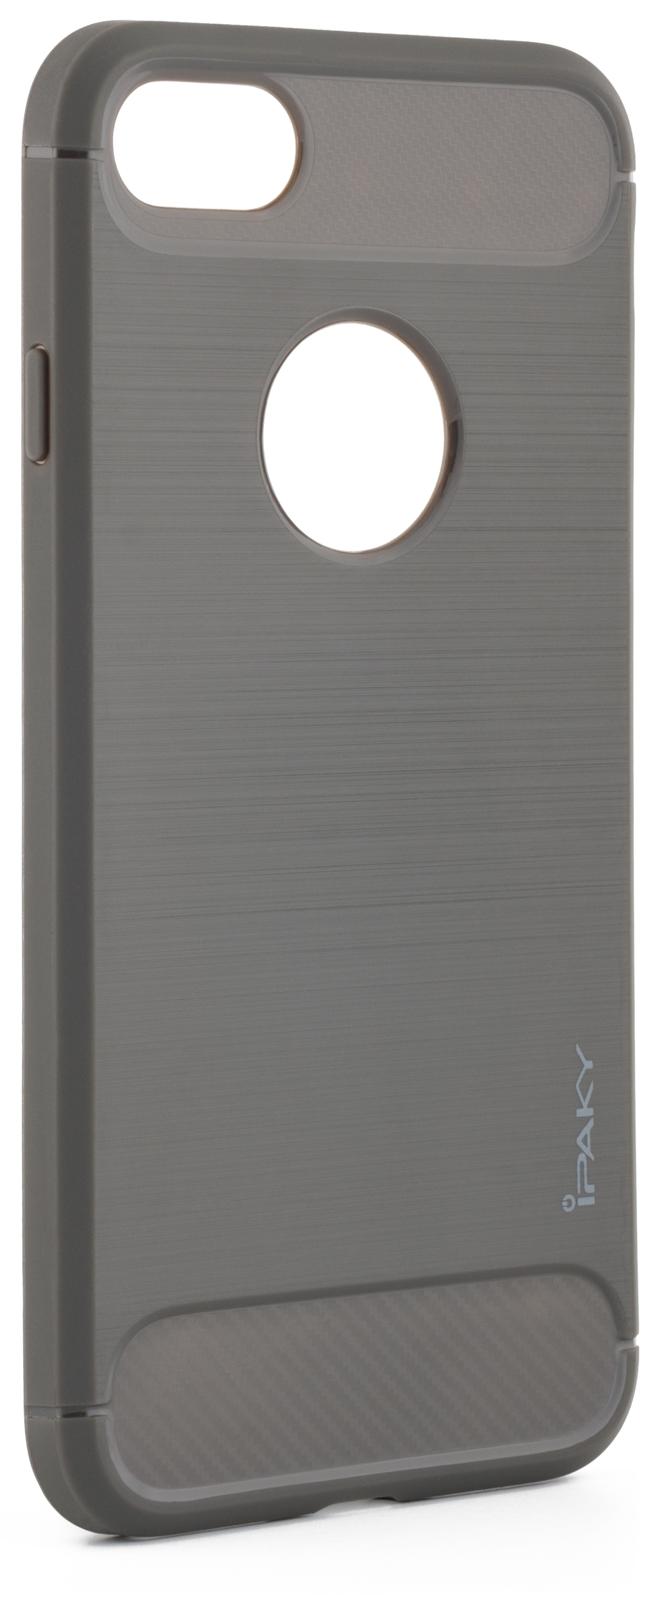 Купить Чохол iPaky для iPhone 7 - slim TPU сірий, iPaky Iphone 7 slim TPU Grey